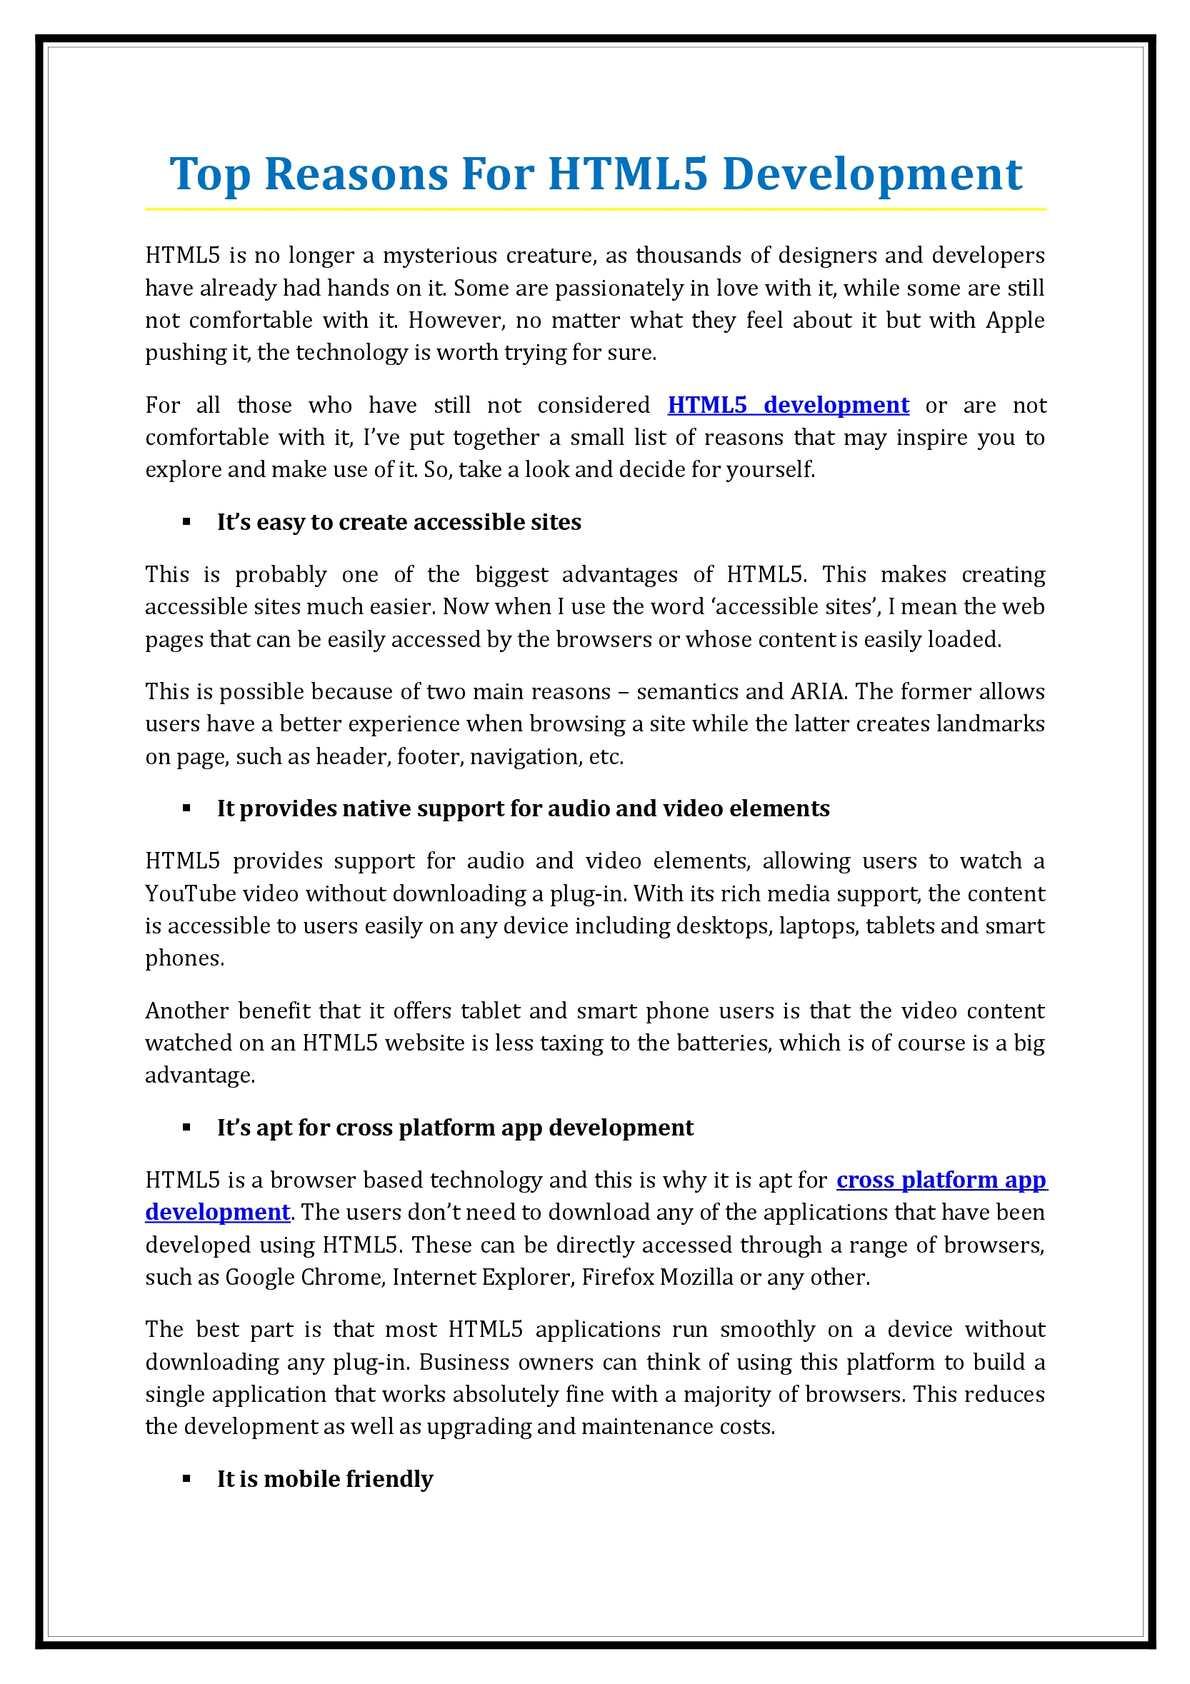 Calaméo - 1Top Reasons For HTML5 Development